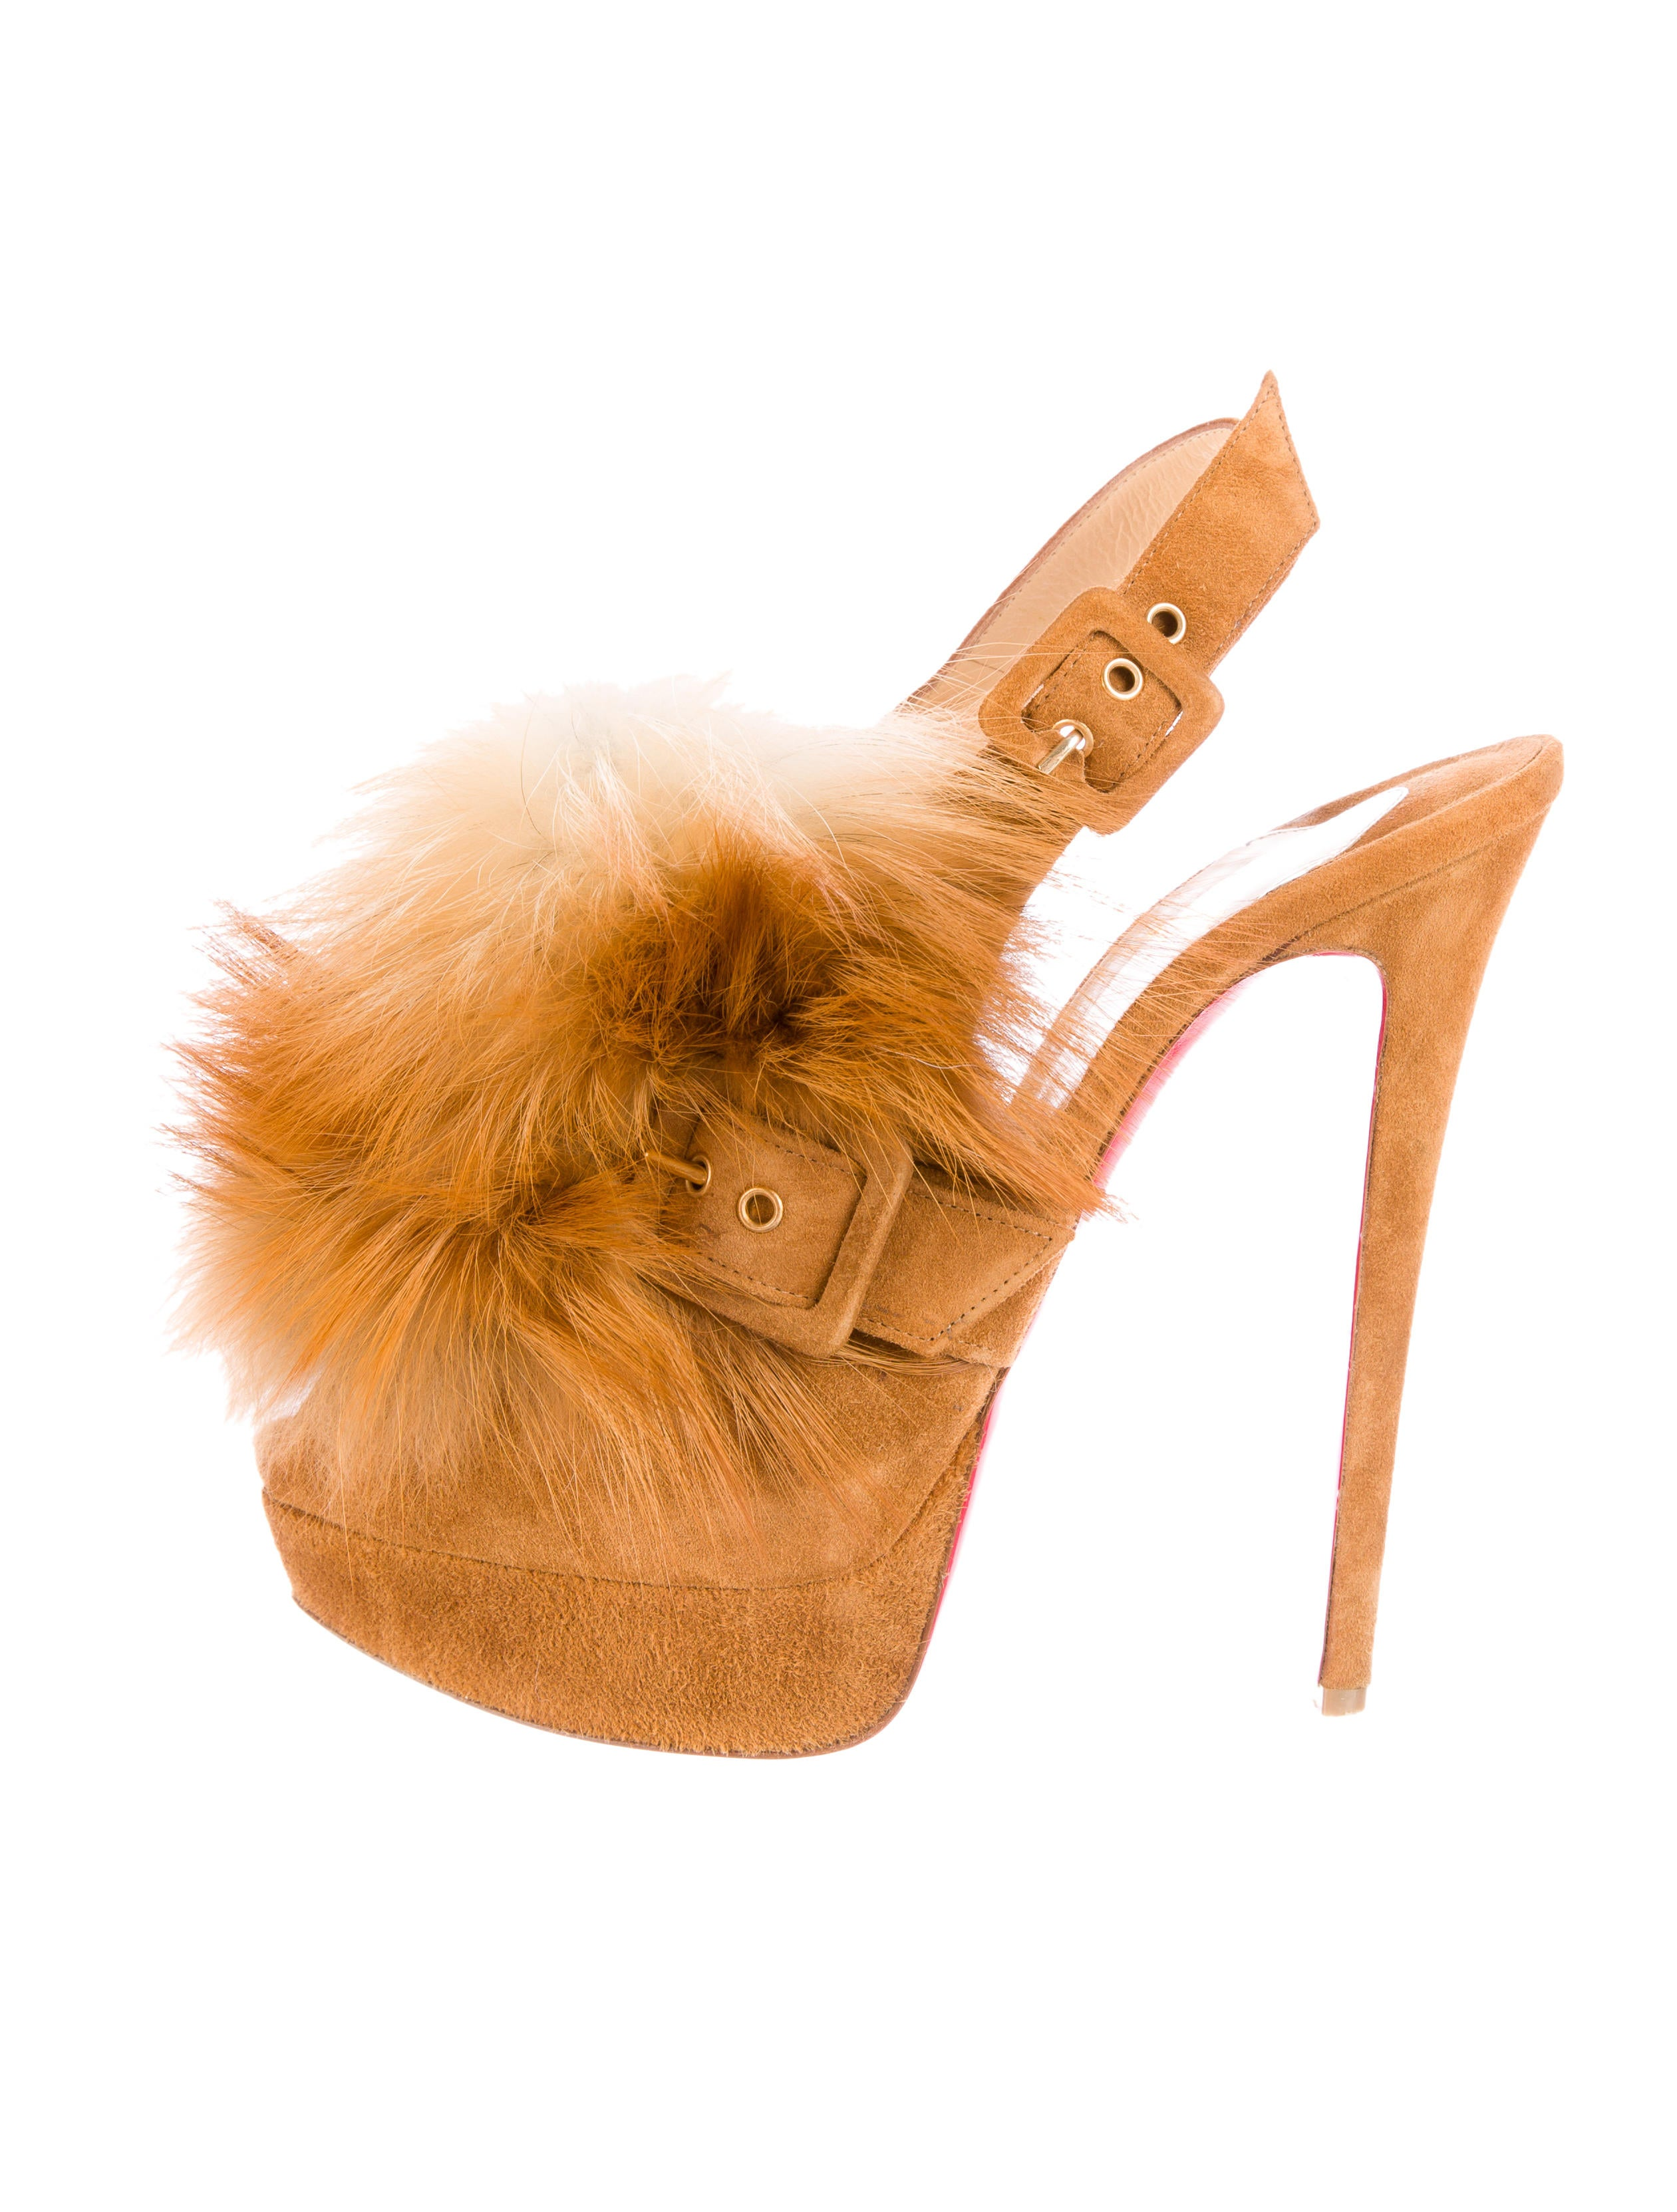 replica louboutin shoes for sale - christian louboutin slingback Splash Fur platform pumps Brown fox ...